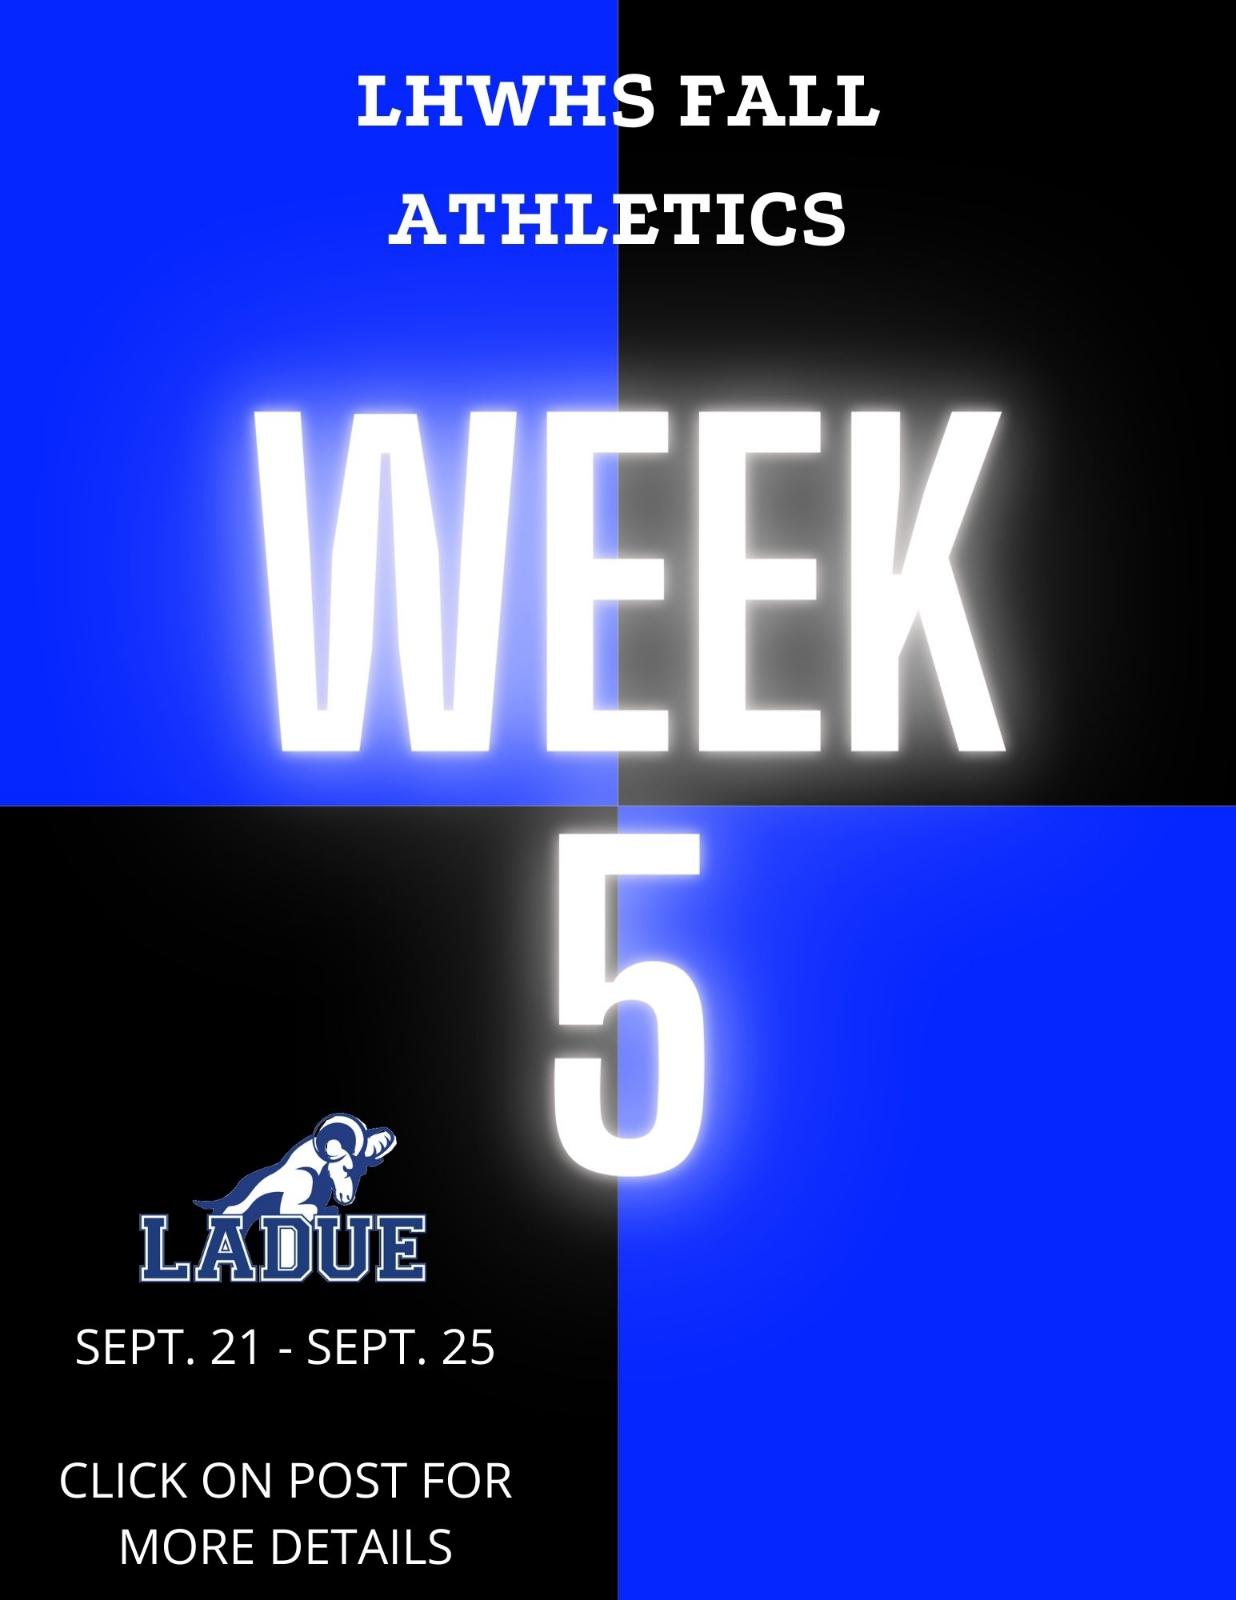 LHWHS Fall Athletics Practice Schedule-Week 5, Sept. 21-25